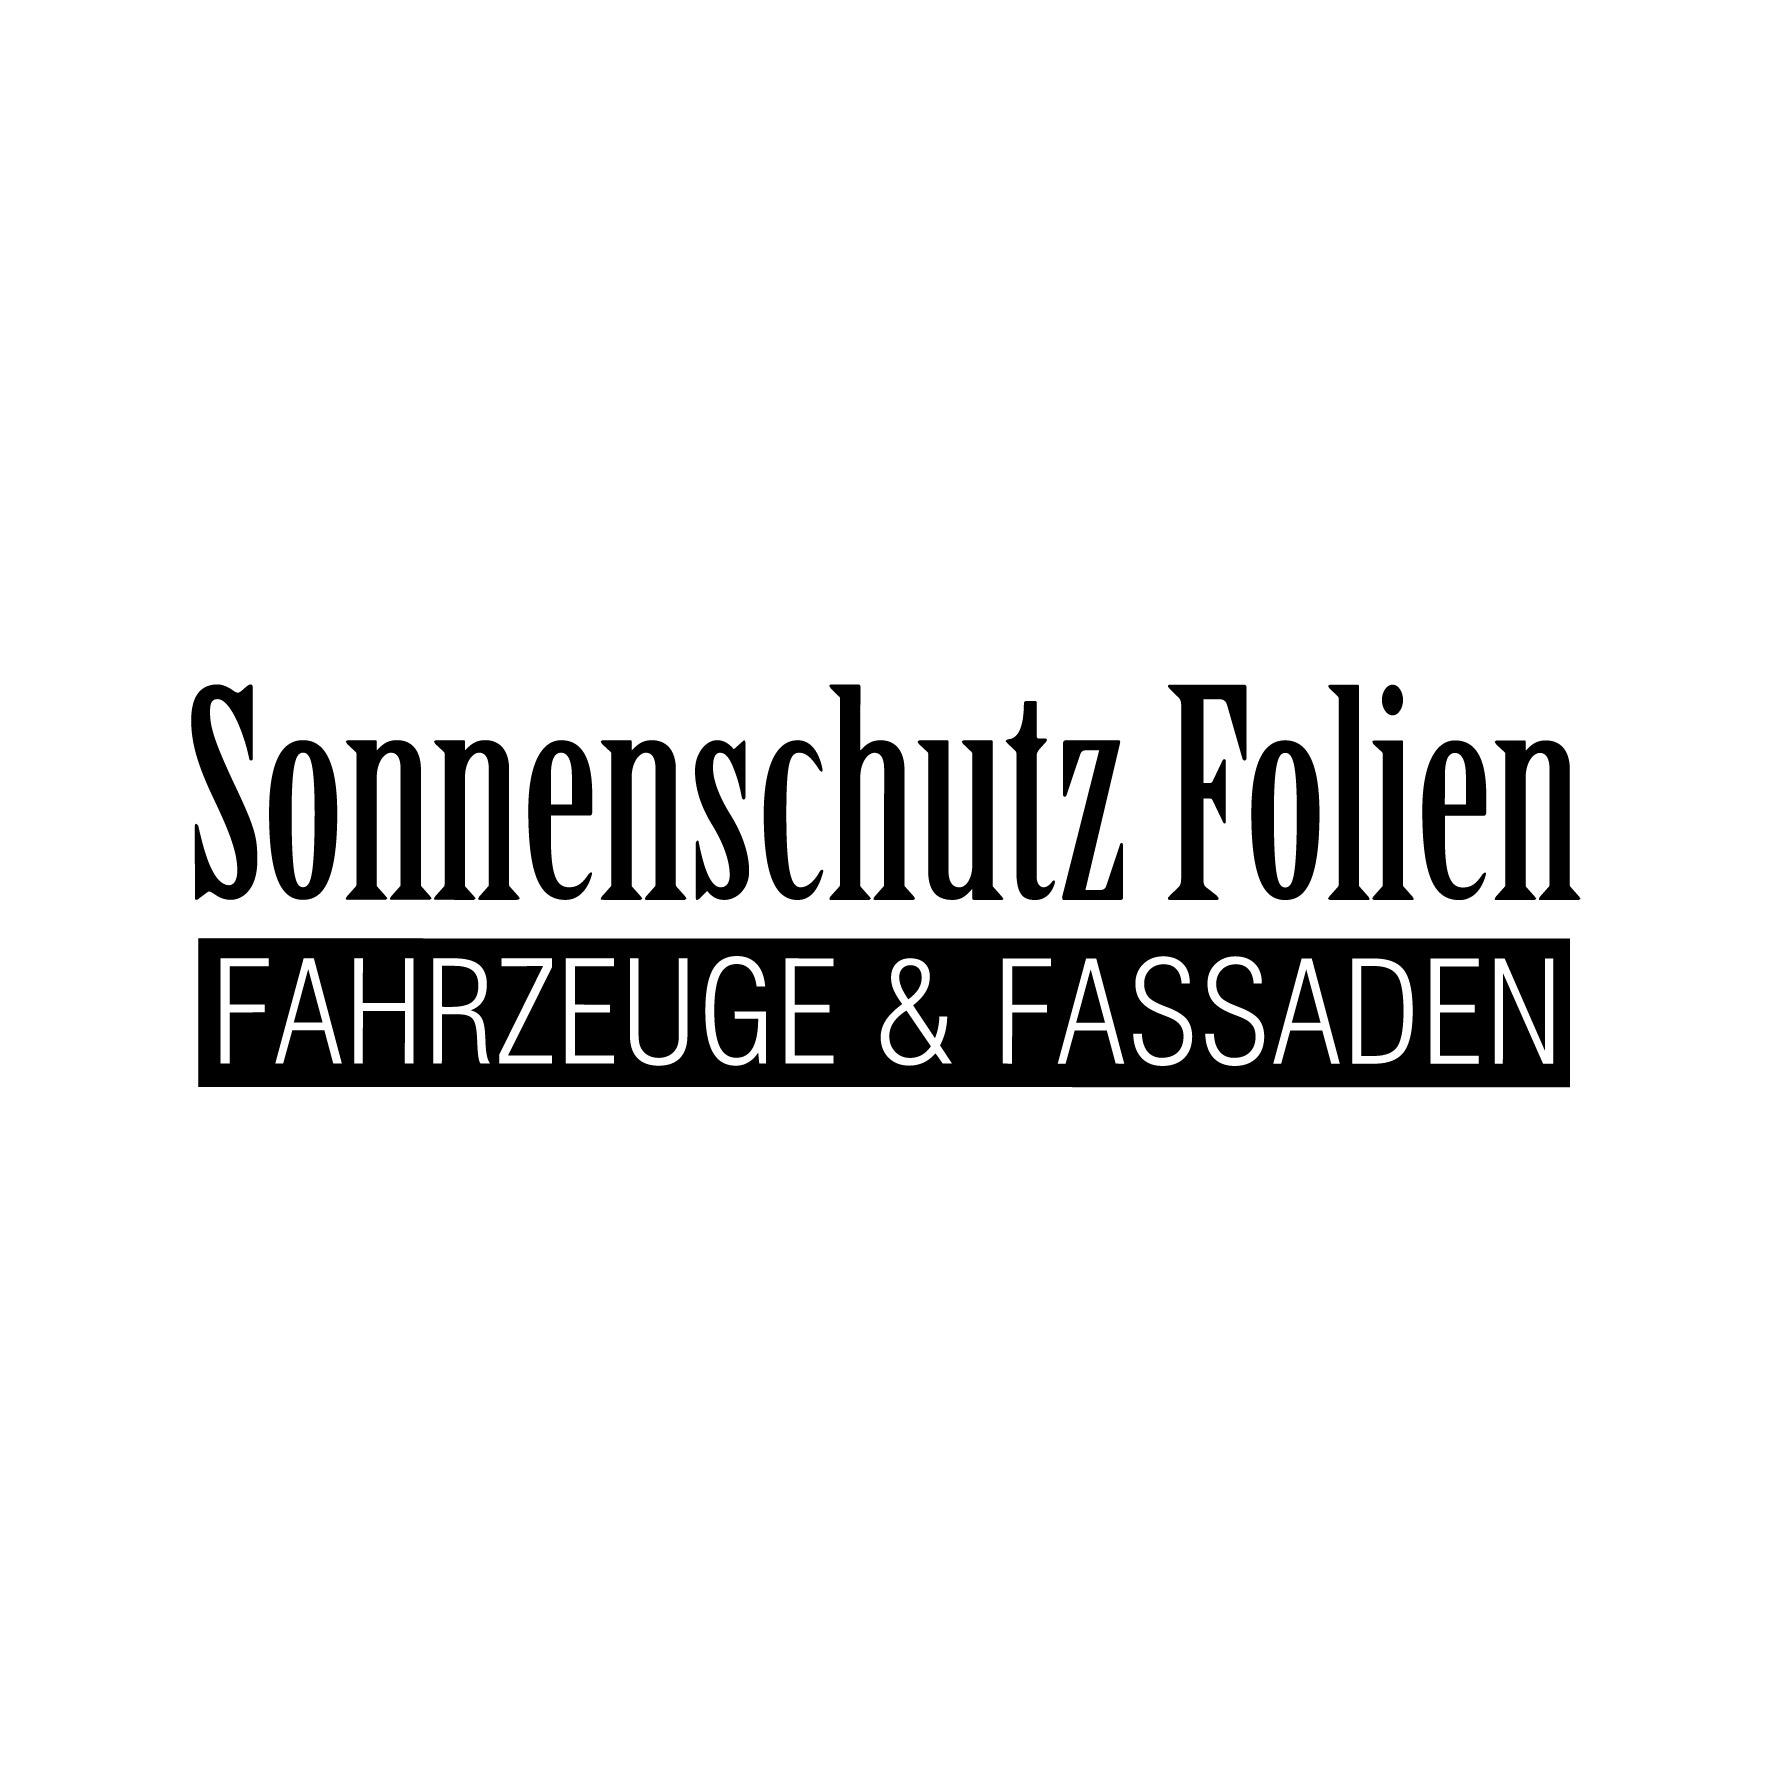 Button_Sonnenschutzfolien-01